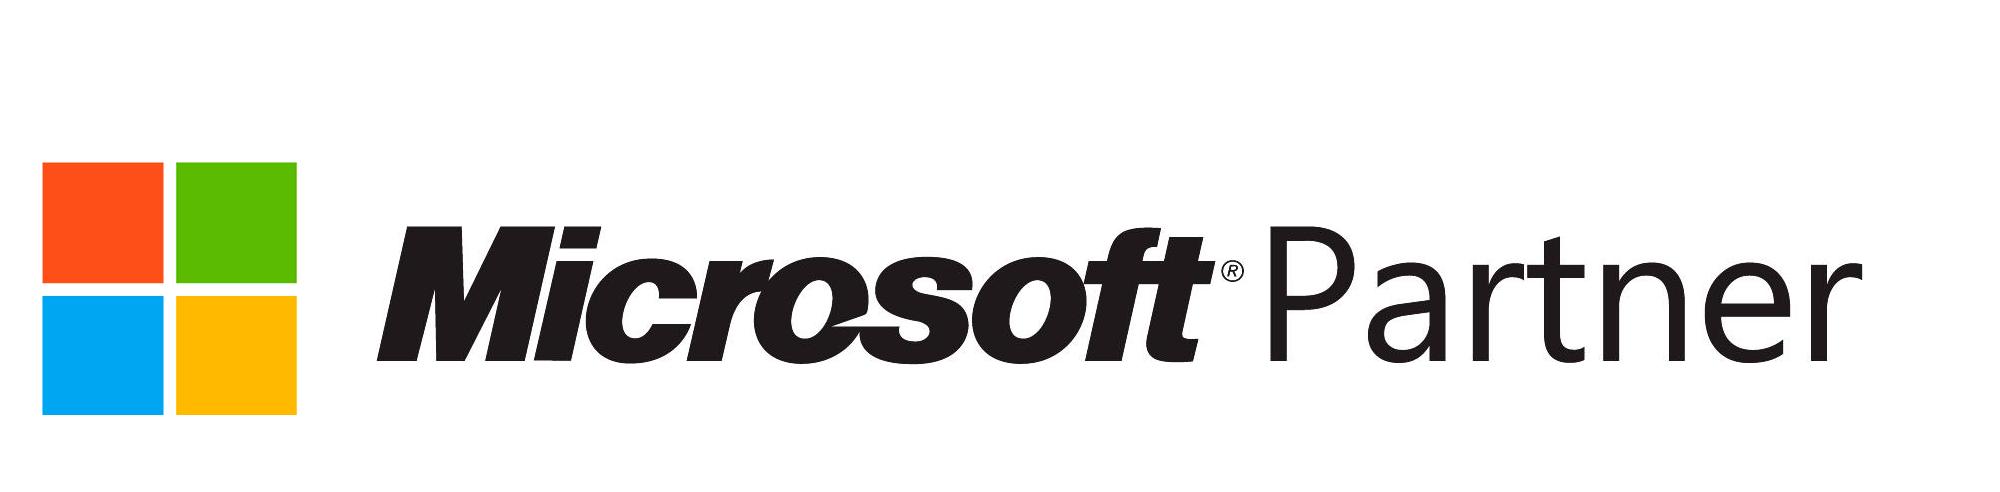 Microsoft Partner Ipswich